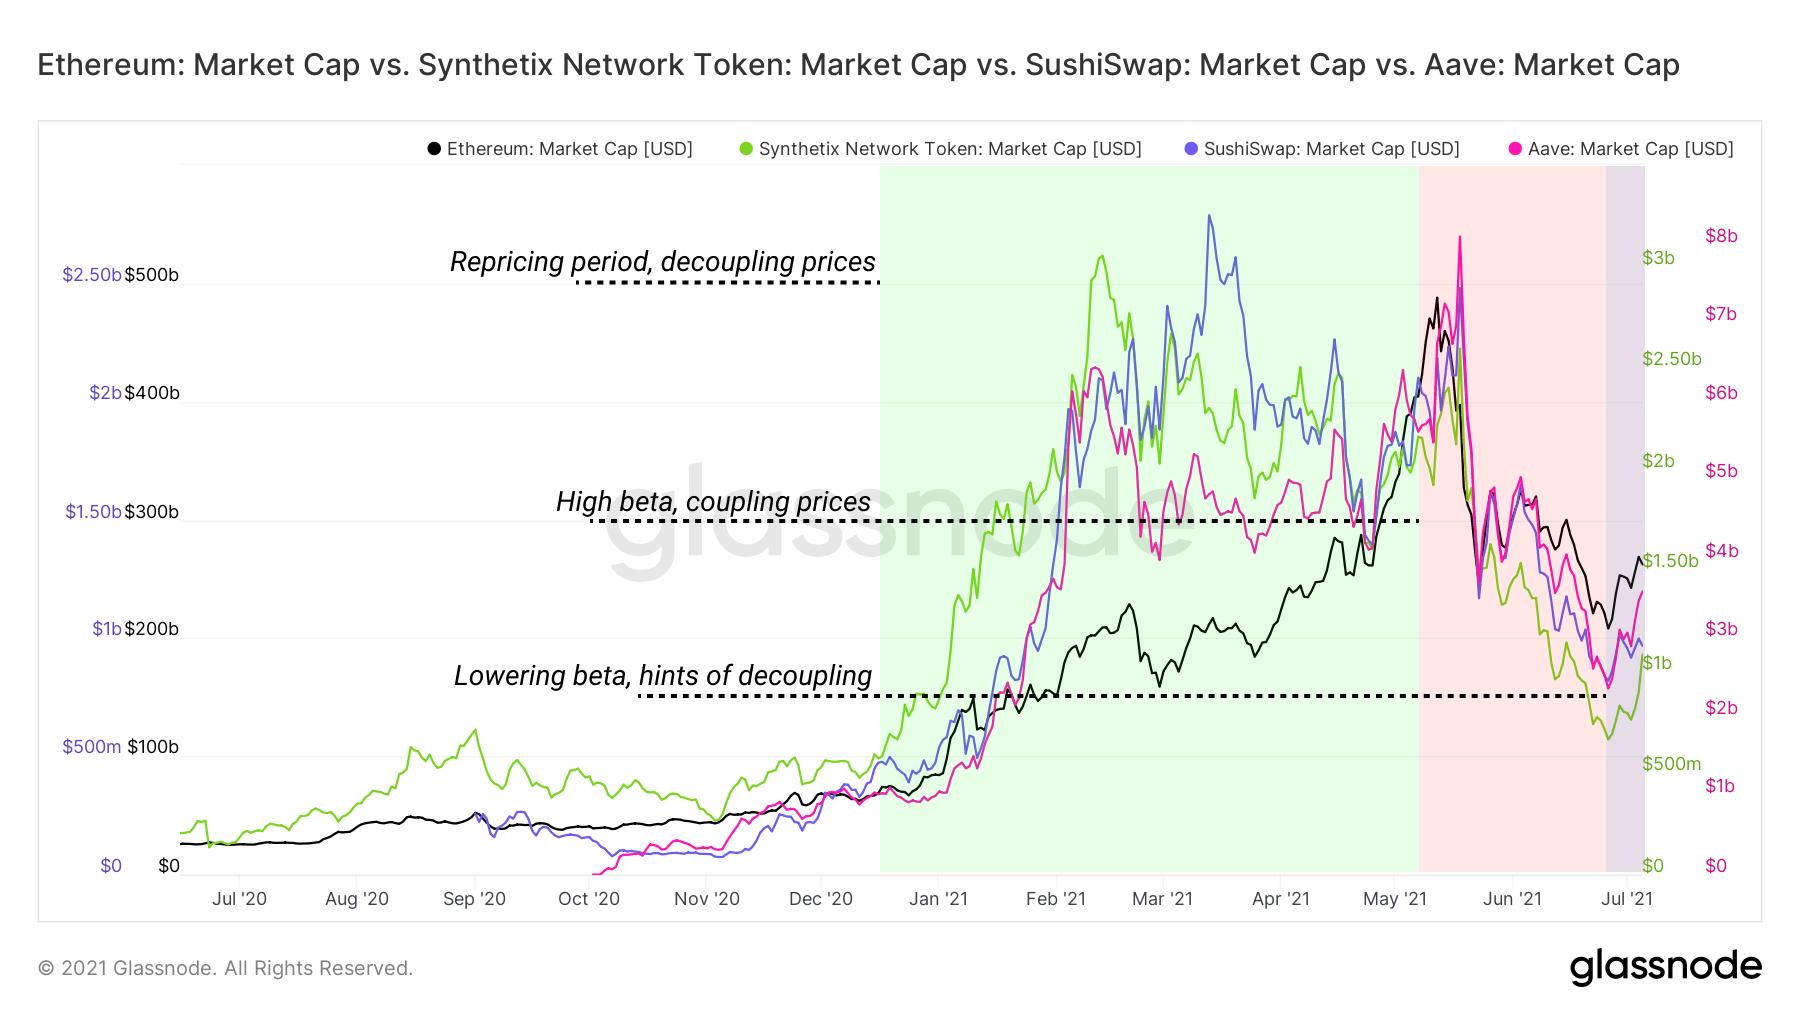 "DeFi开始复苏?多数""蓝筹股""涨超50%,Polygon表现依然强劲"